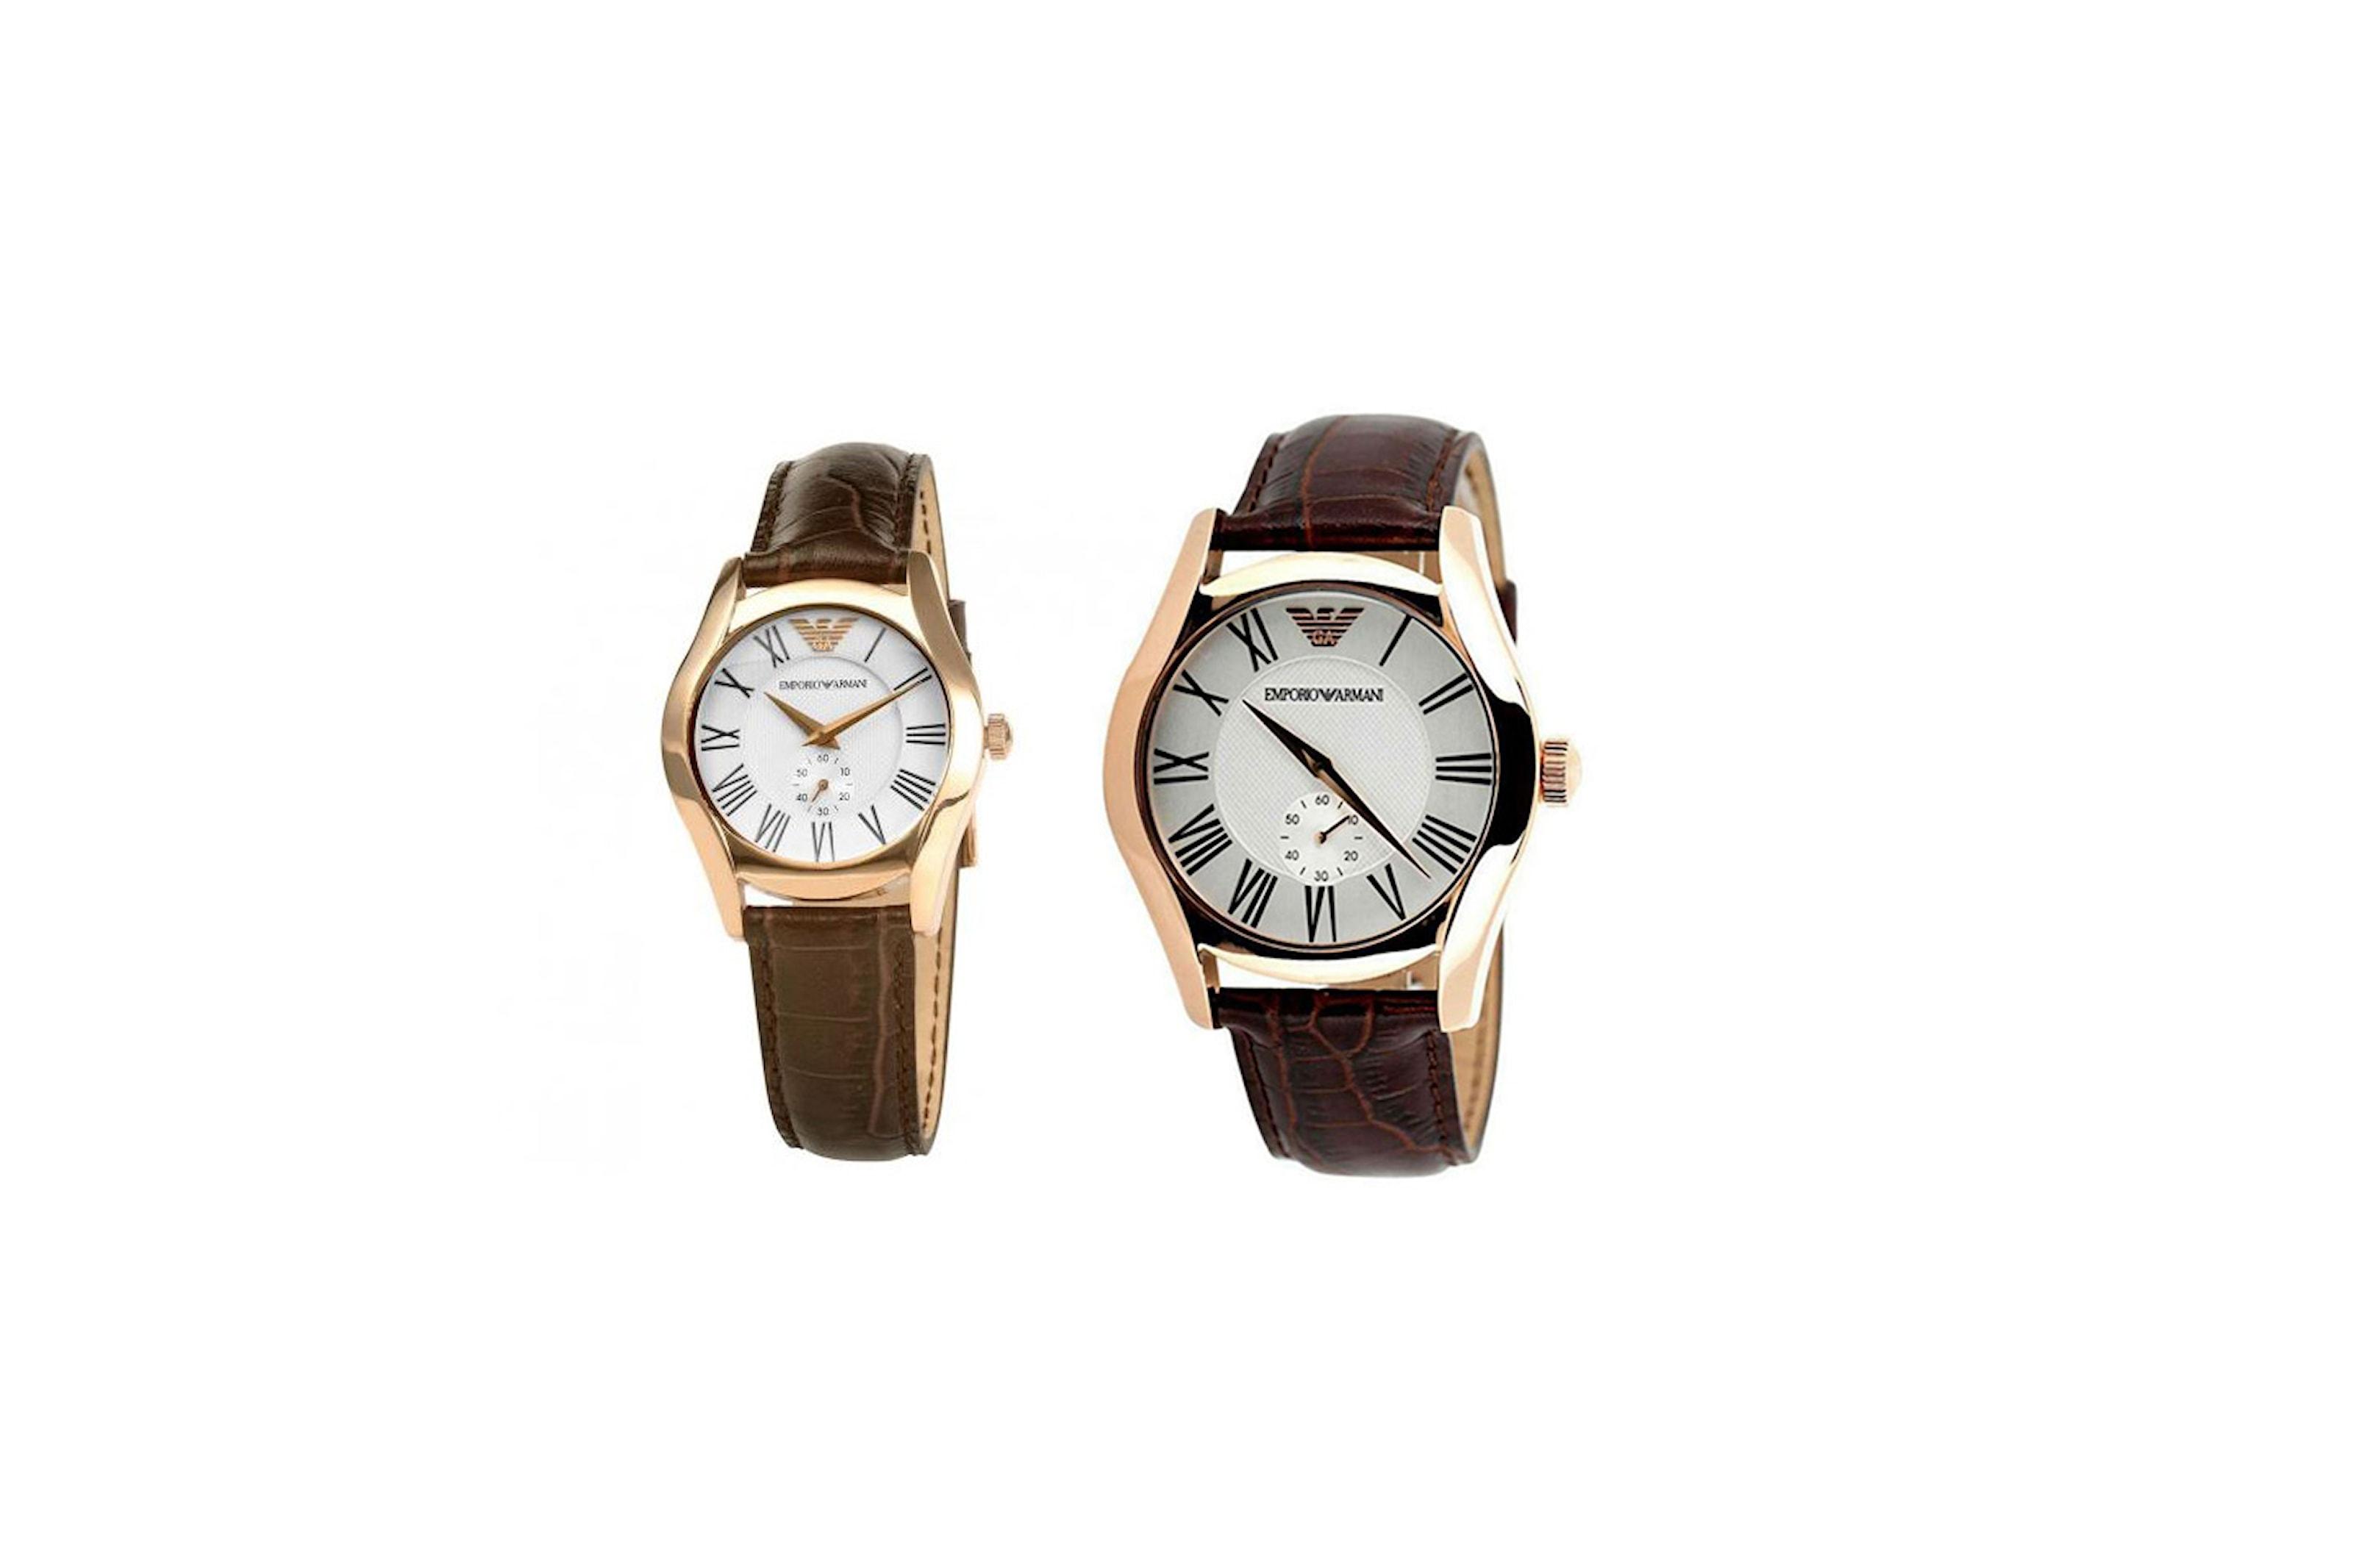 Klockor från Armani